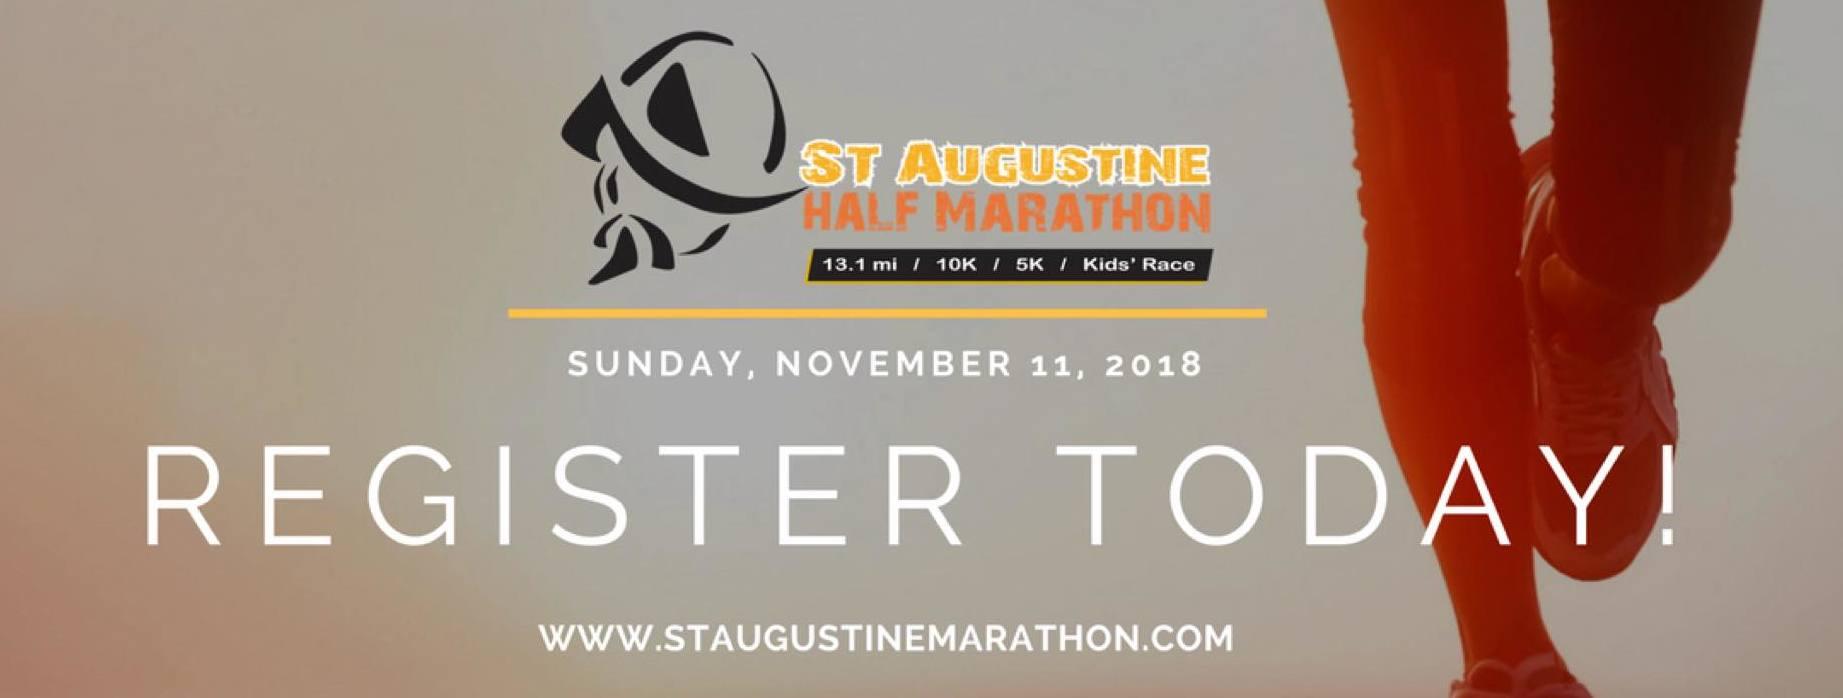 image for st aug half marathon